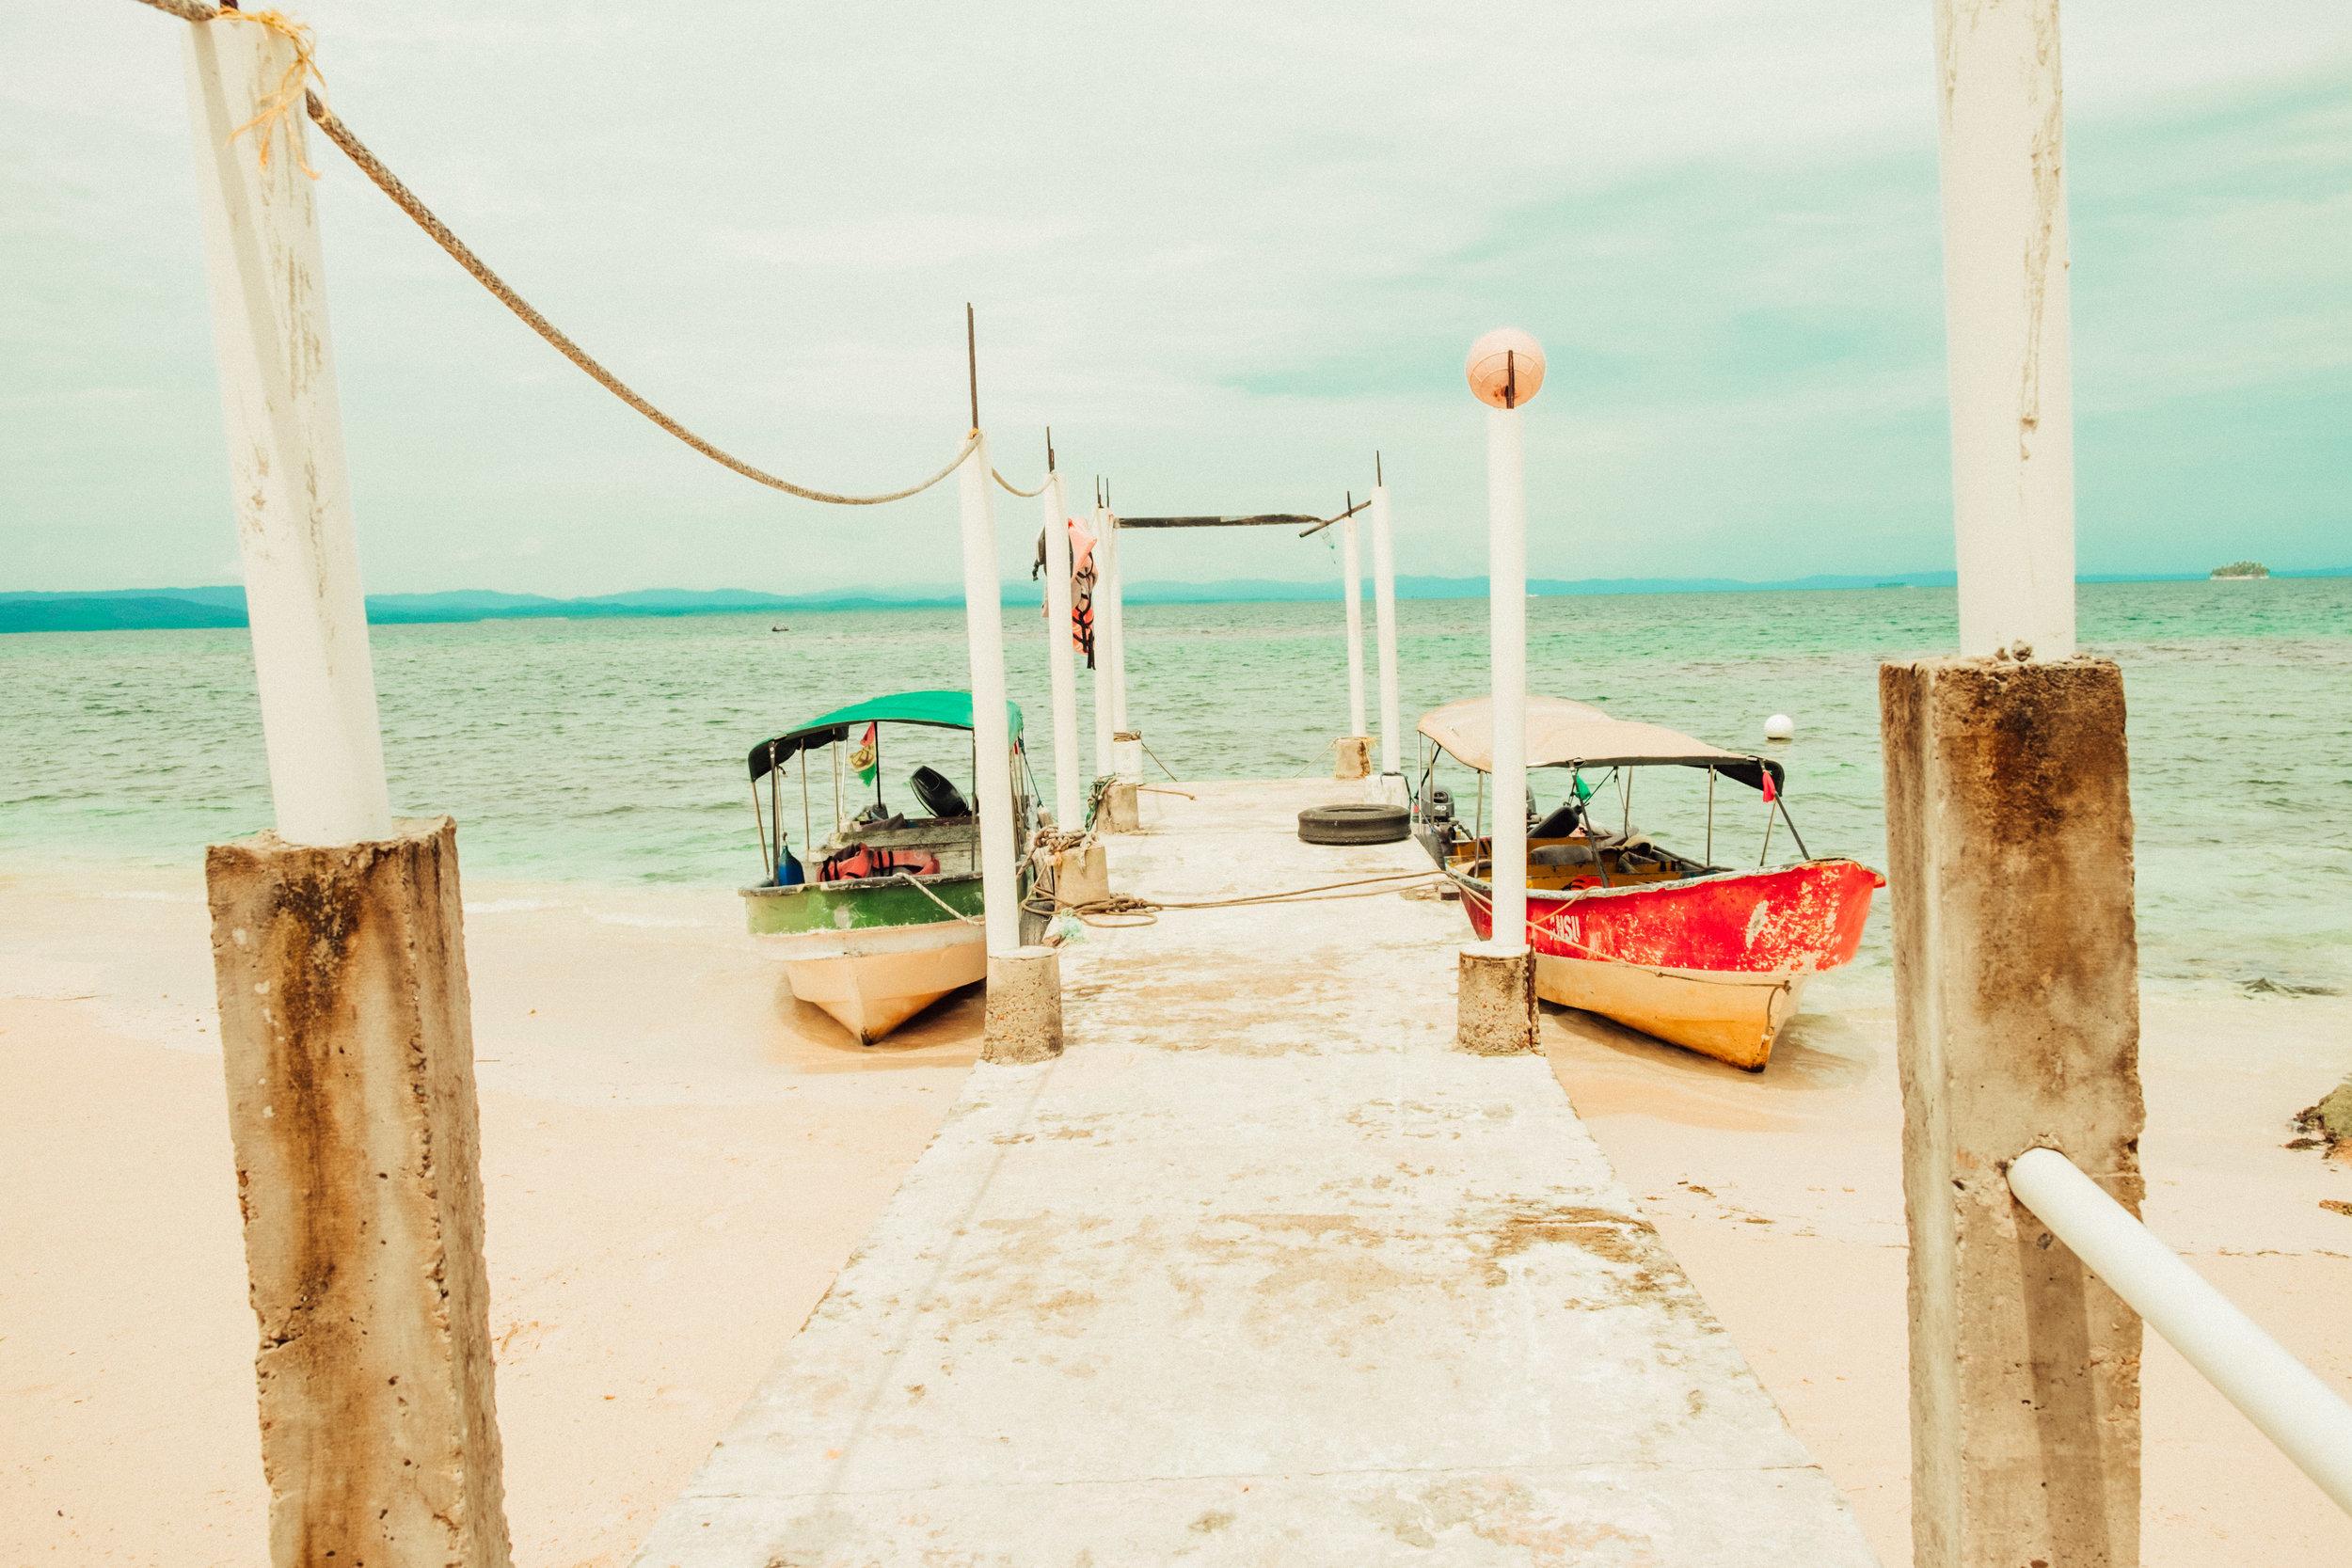 San Blas Island boats